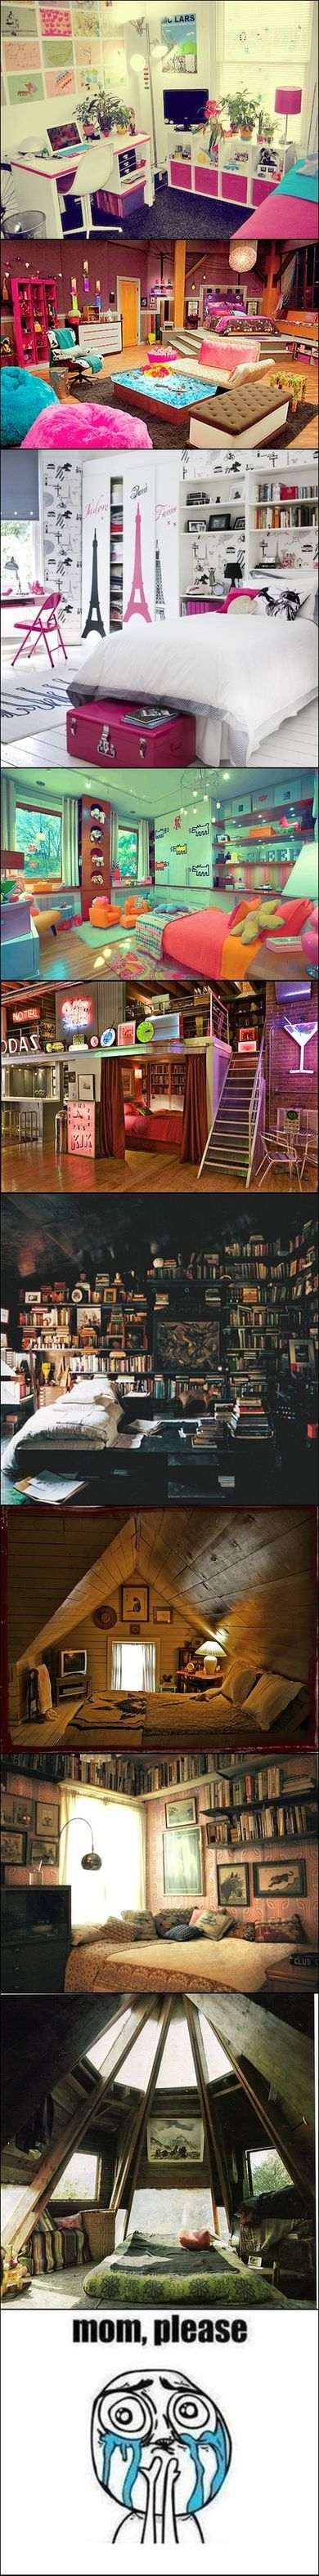 ... room makeovers i had icarly bedroom apartments dreams bedroom ideas